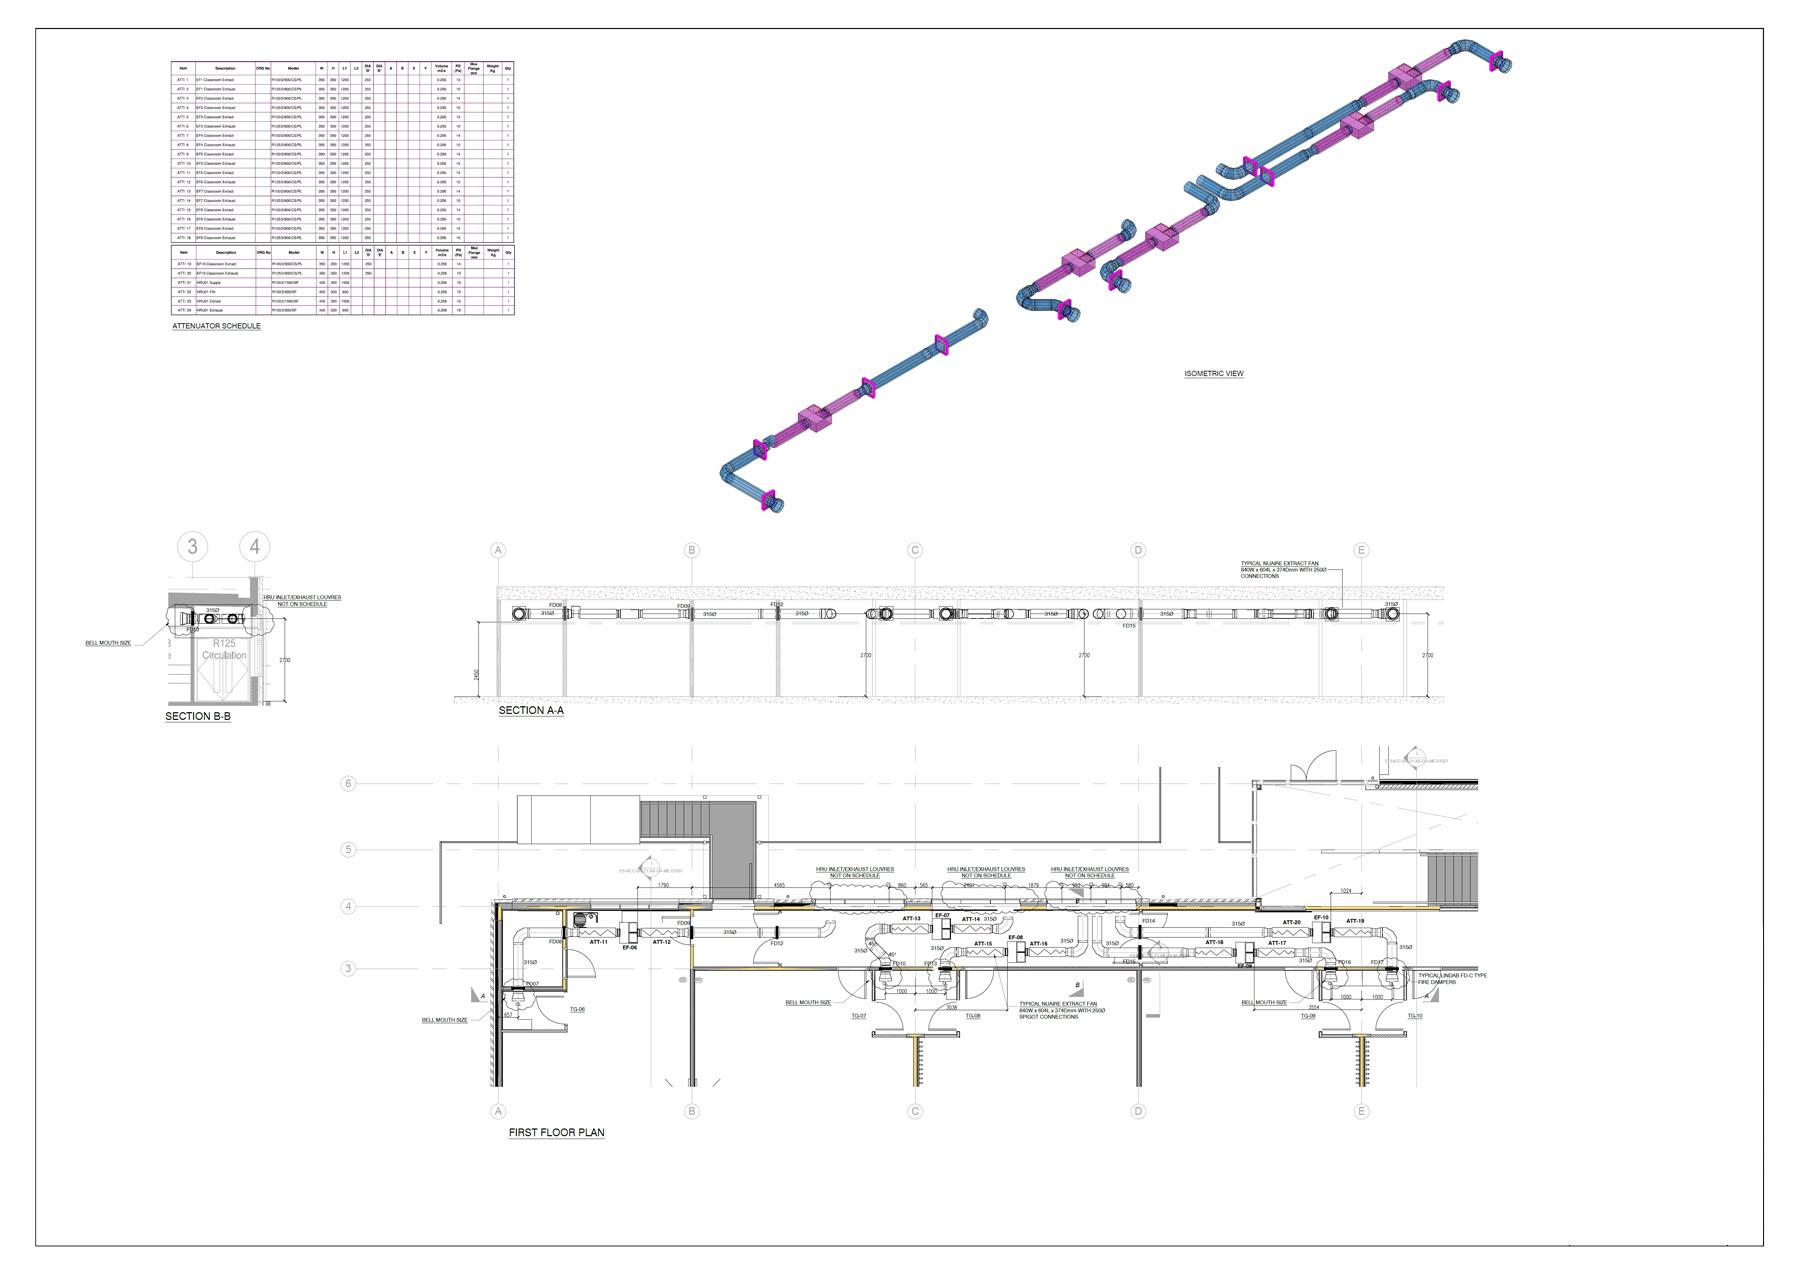 Ductwork Schematics - Wiring Diagrams on